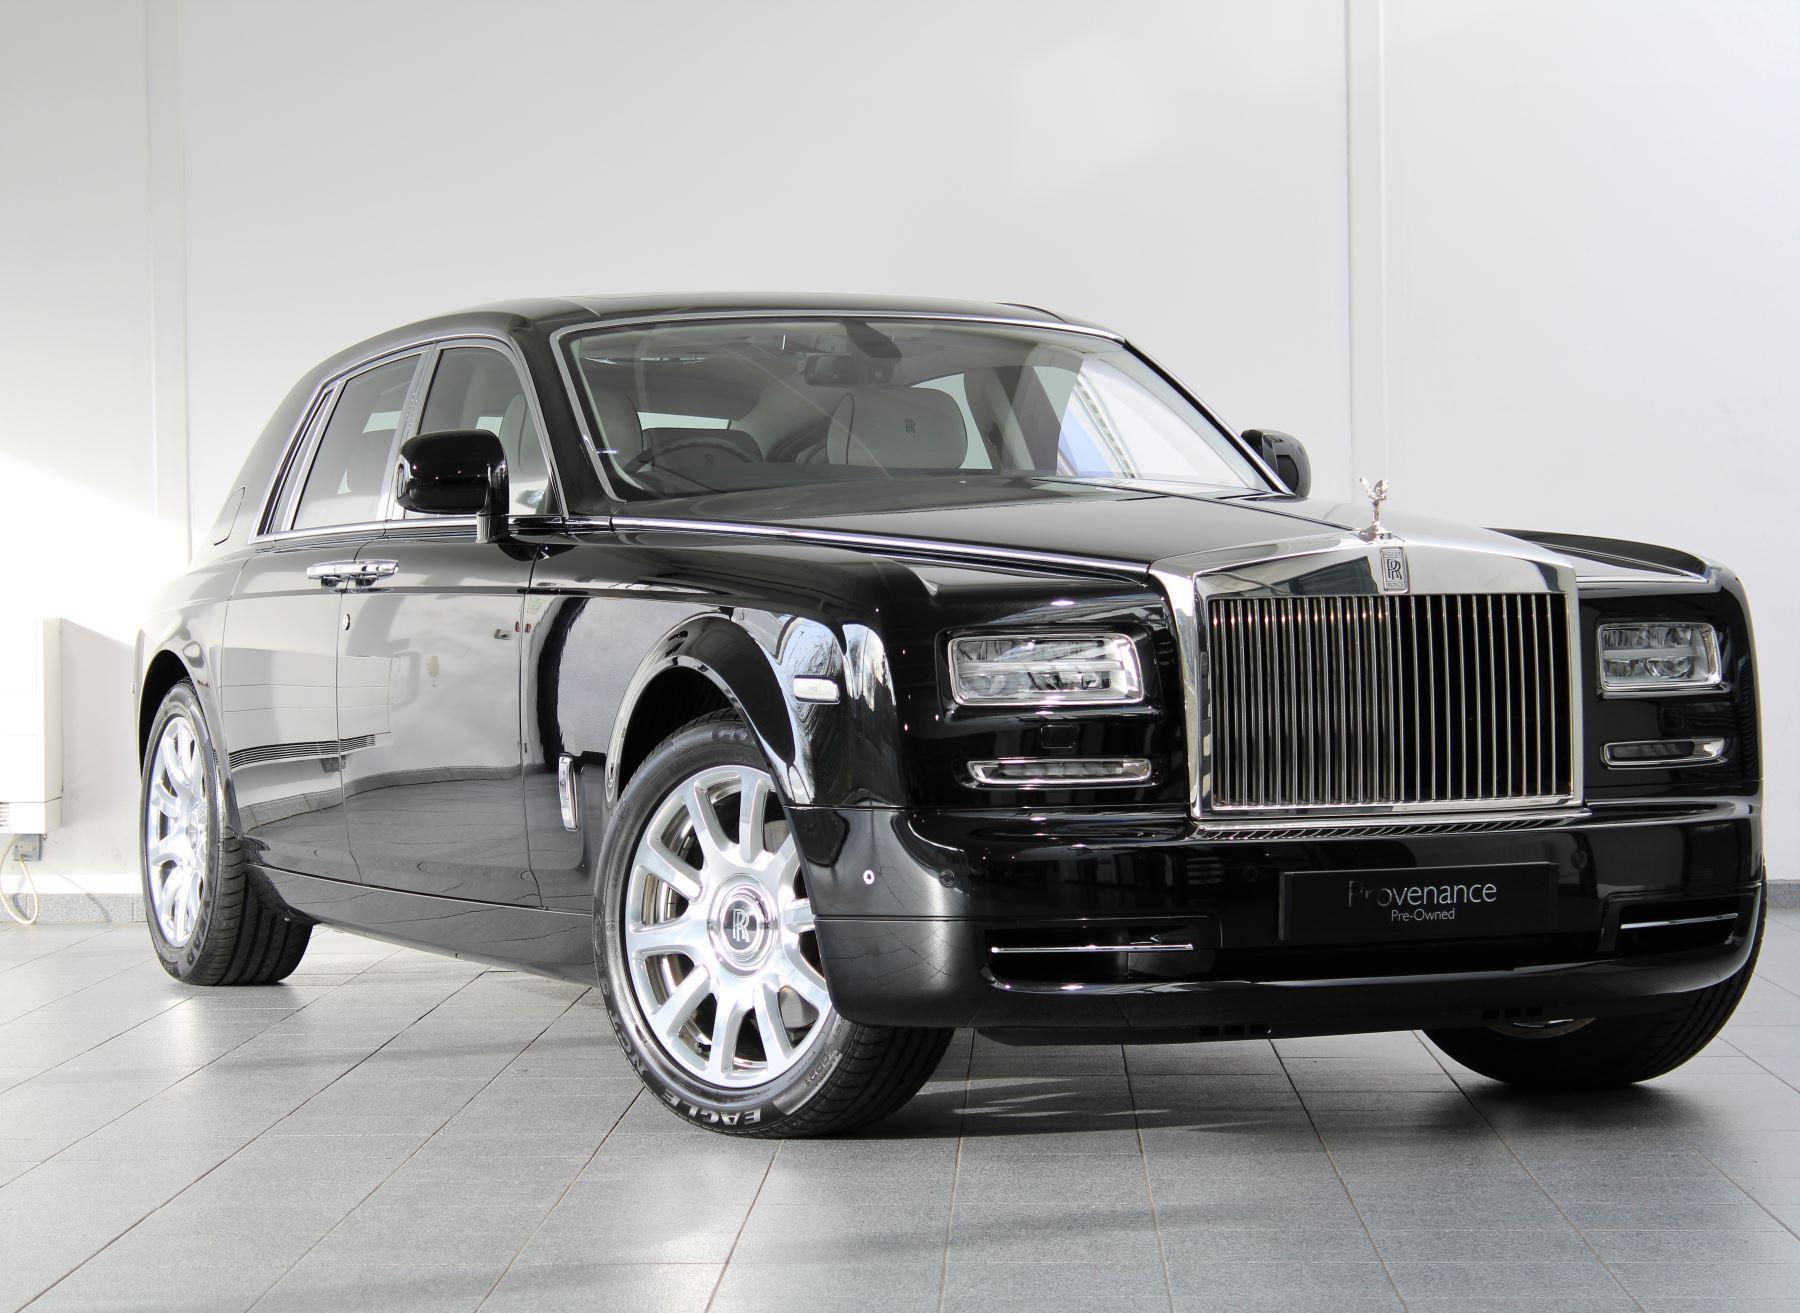 Rolls-Royce Phantom II 4dr Auto image 4